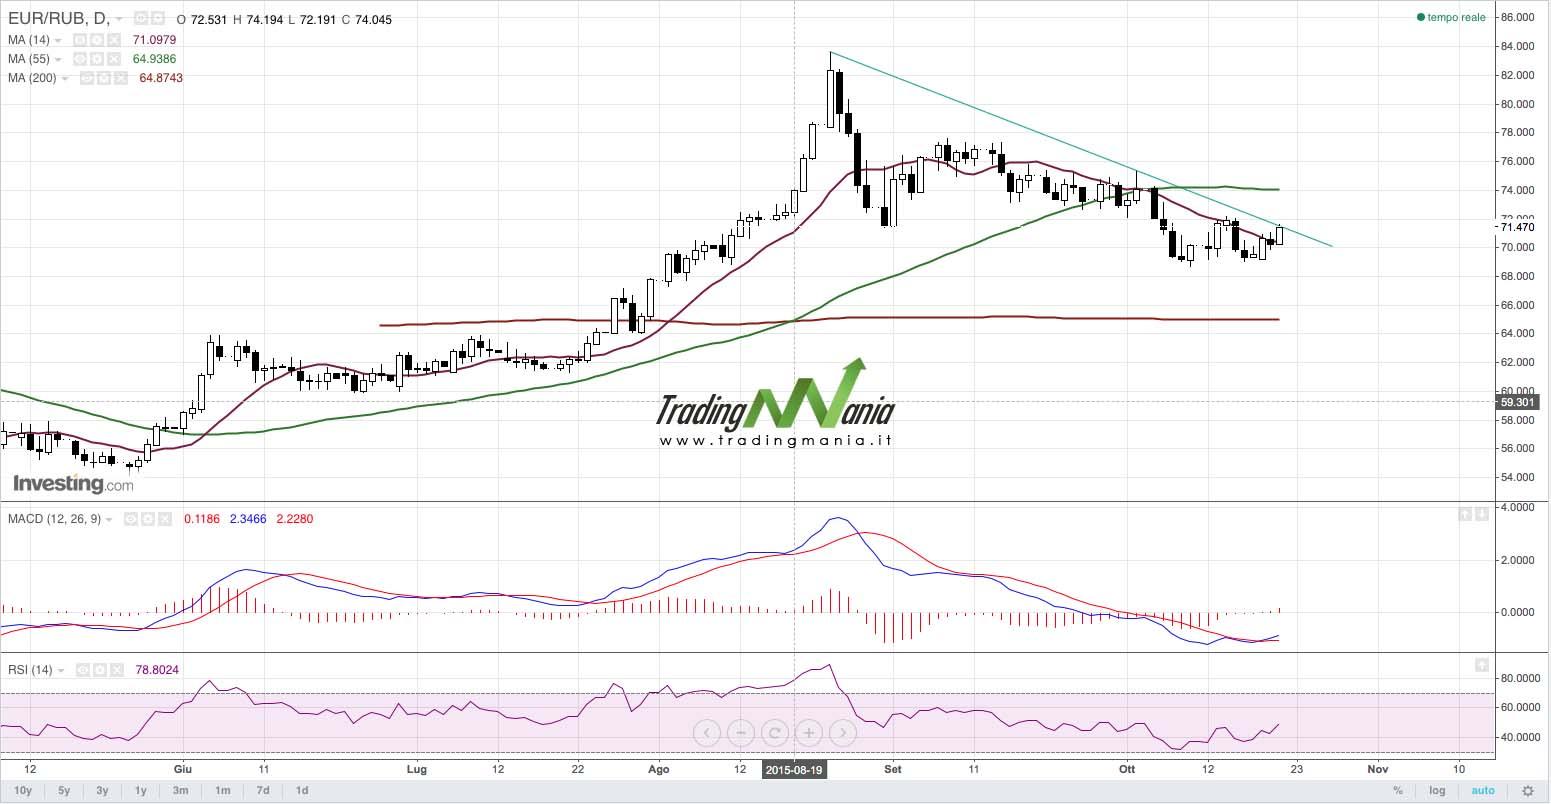 Forex: EURRUB tocca la trendline ribassista